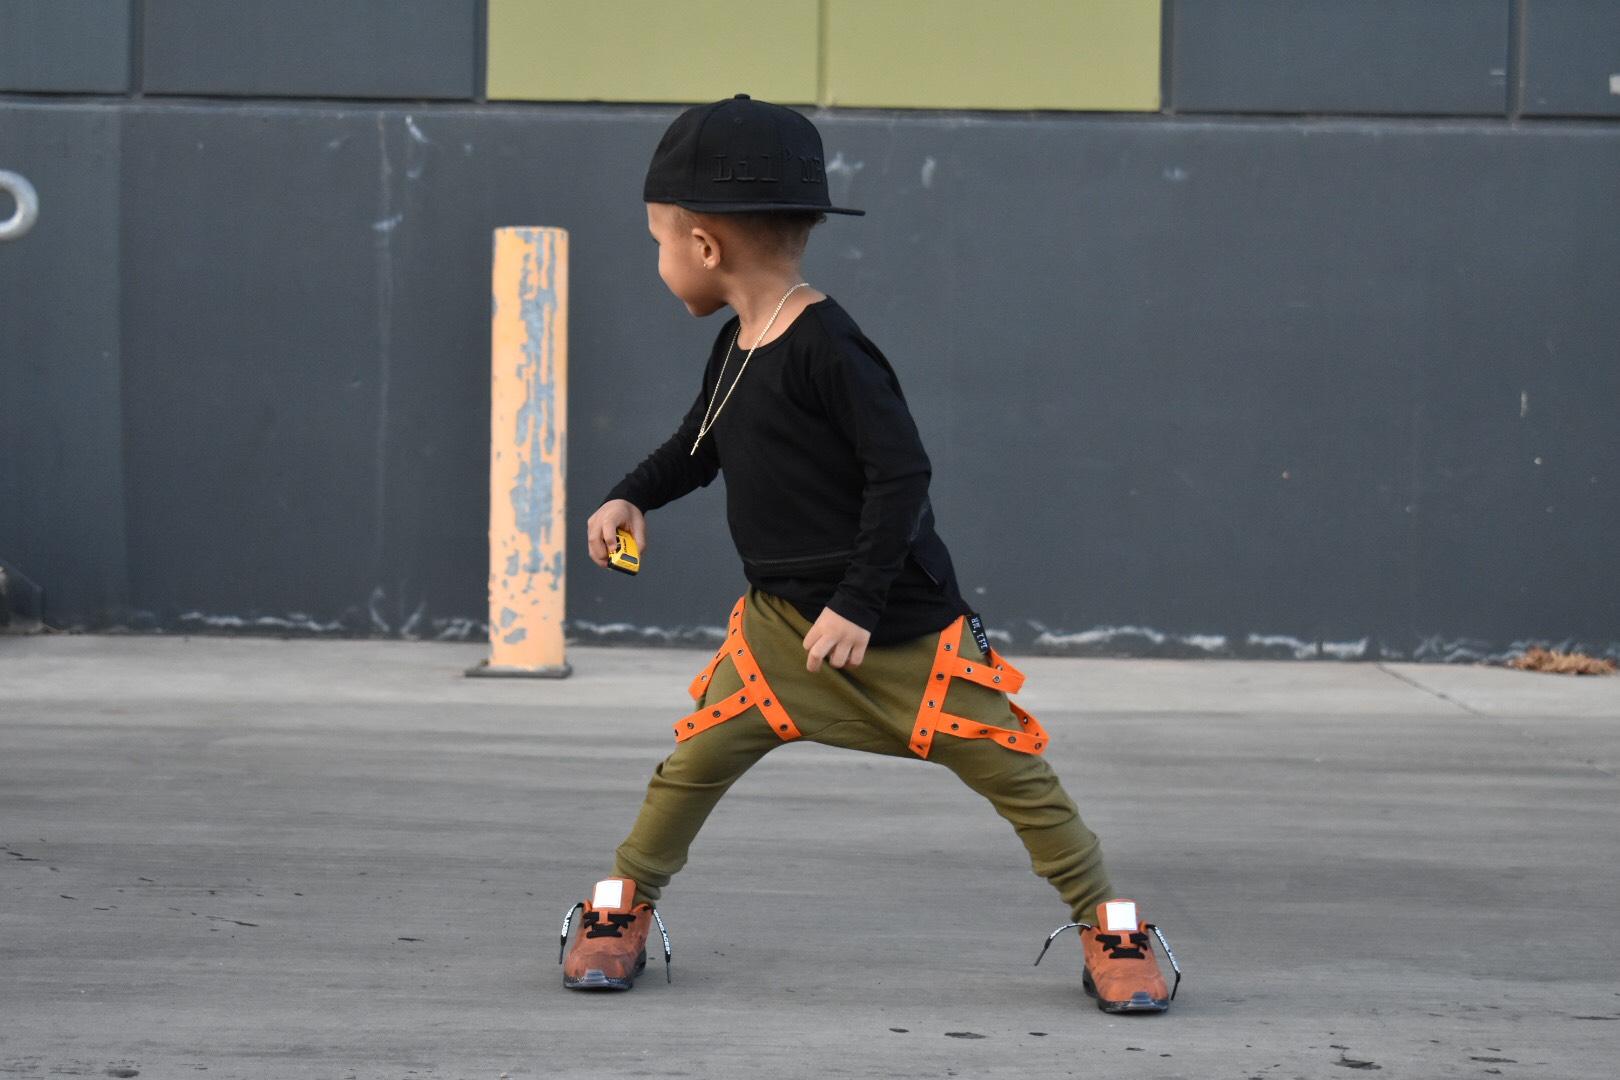 LIL' COMMANDO'S, HAREM PANTS / JOGGERS - Khaki with orange tape